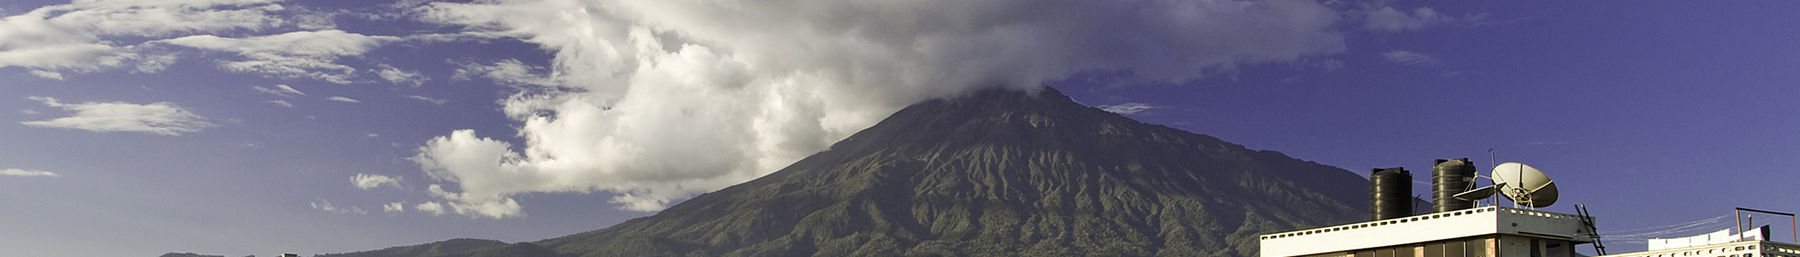 Mount Meru Hotel Rooms